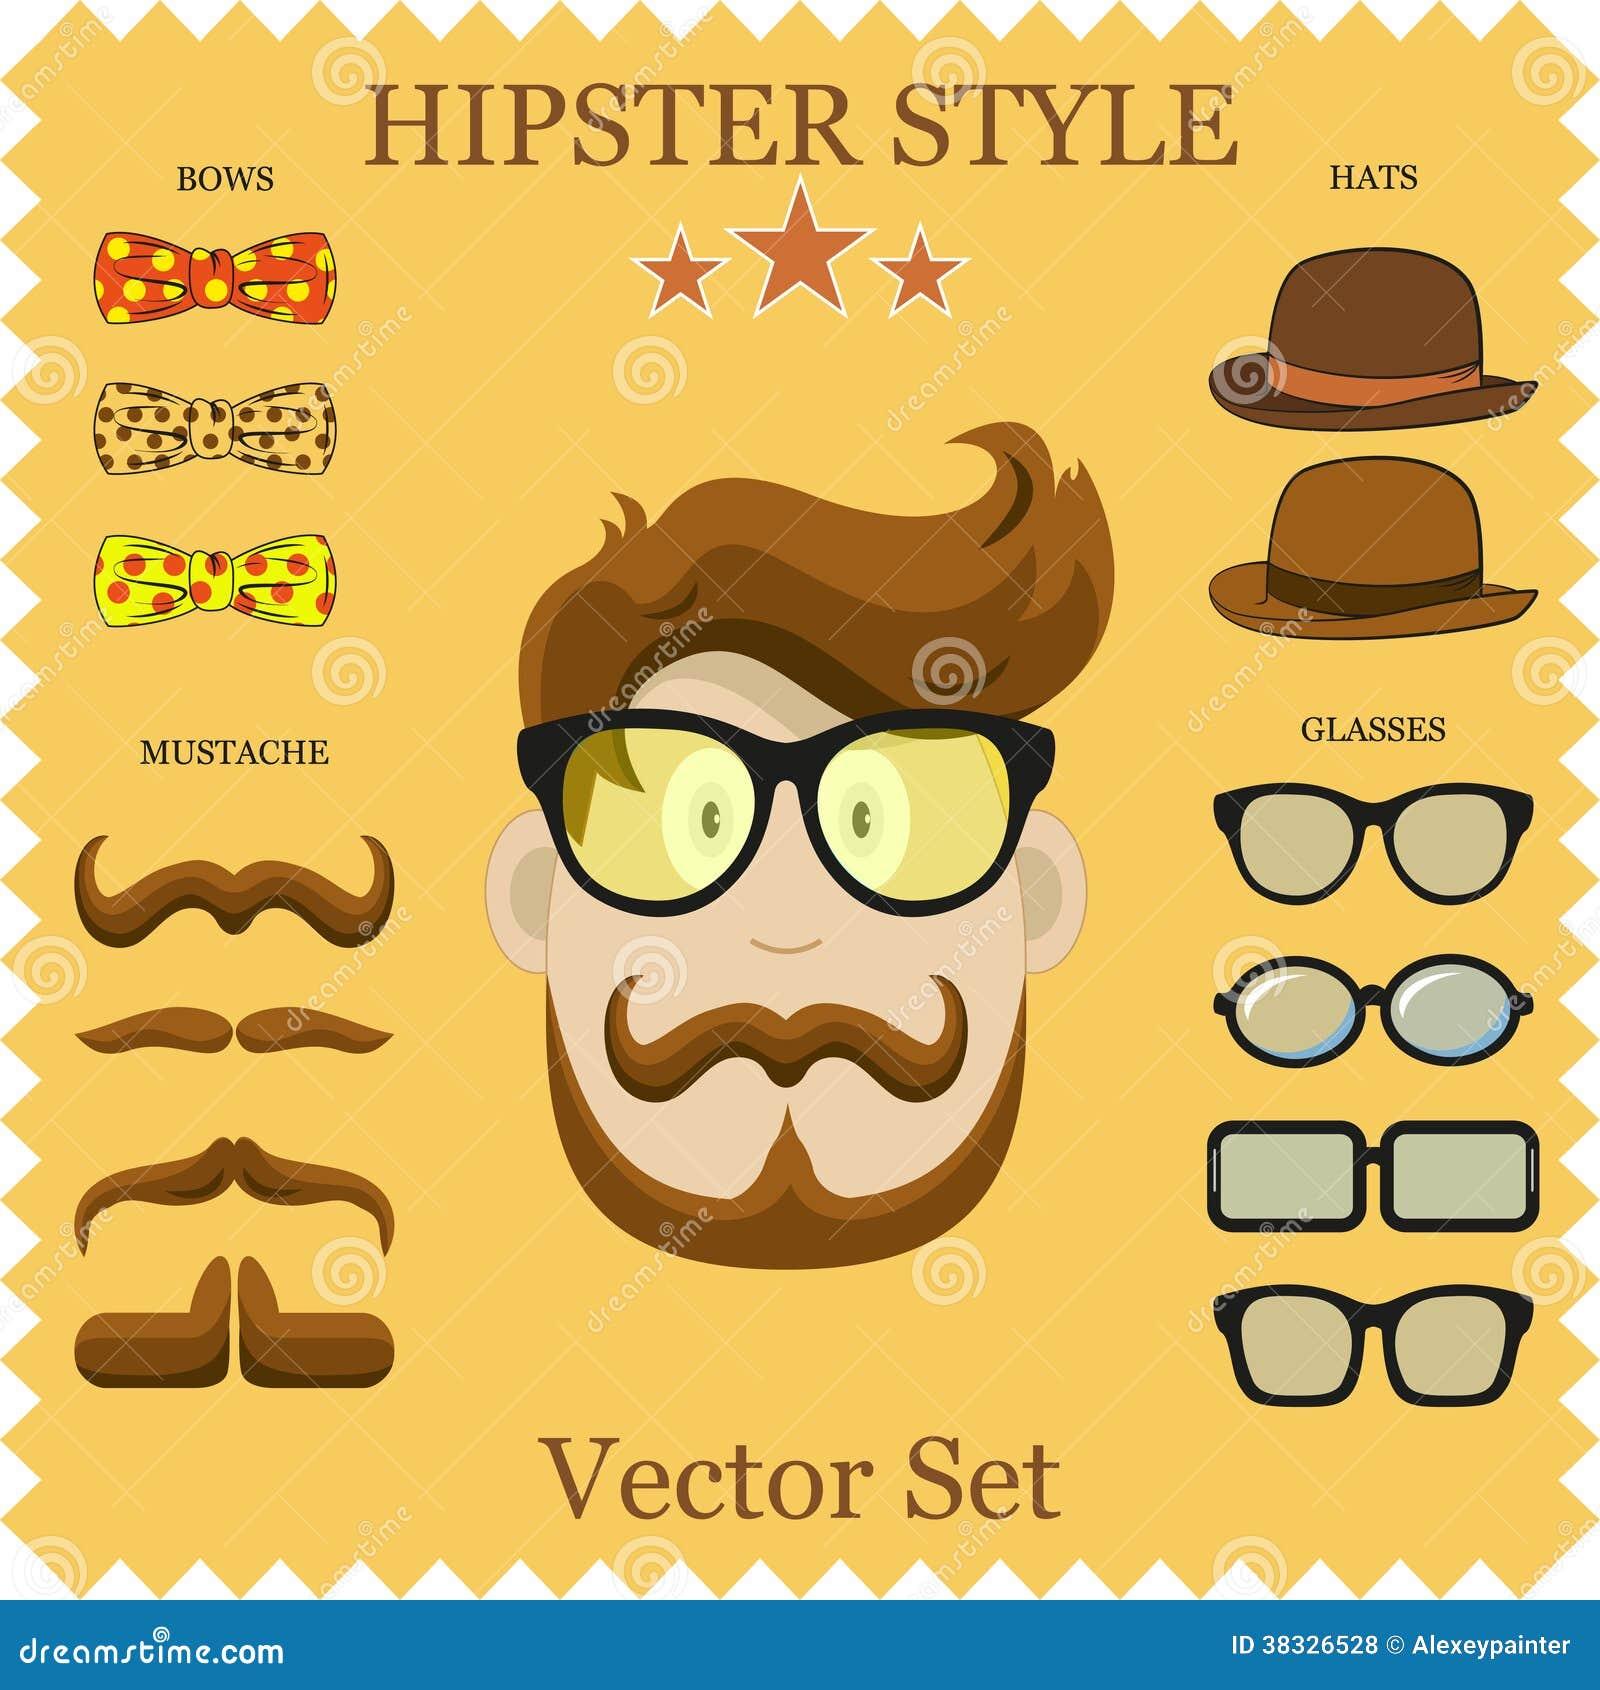 Vector Character Design Illustrator : Hipster character vector illustration with